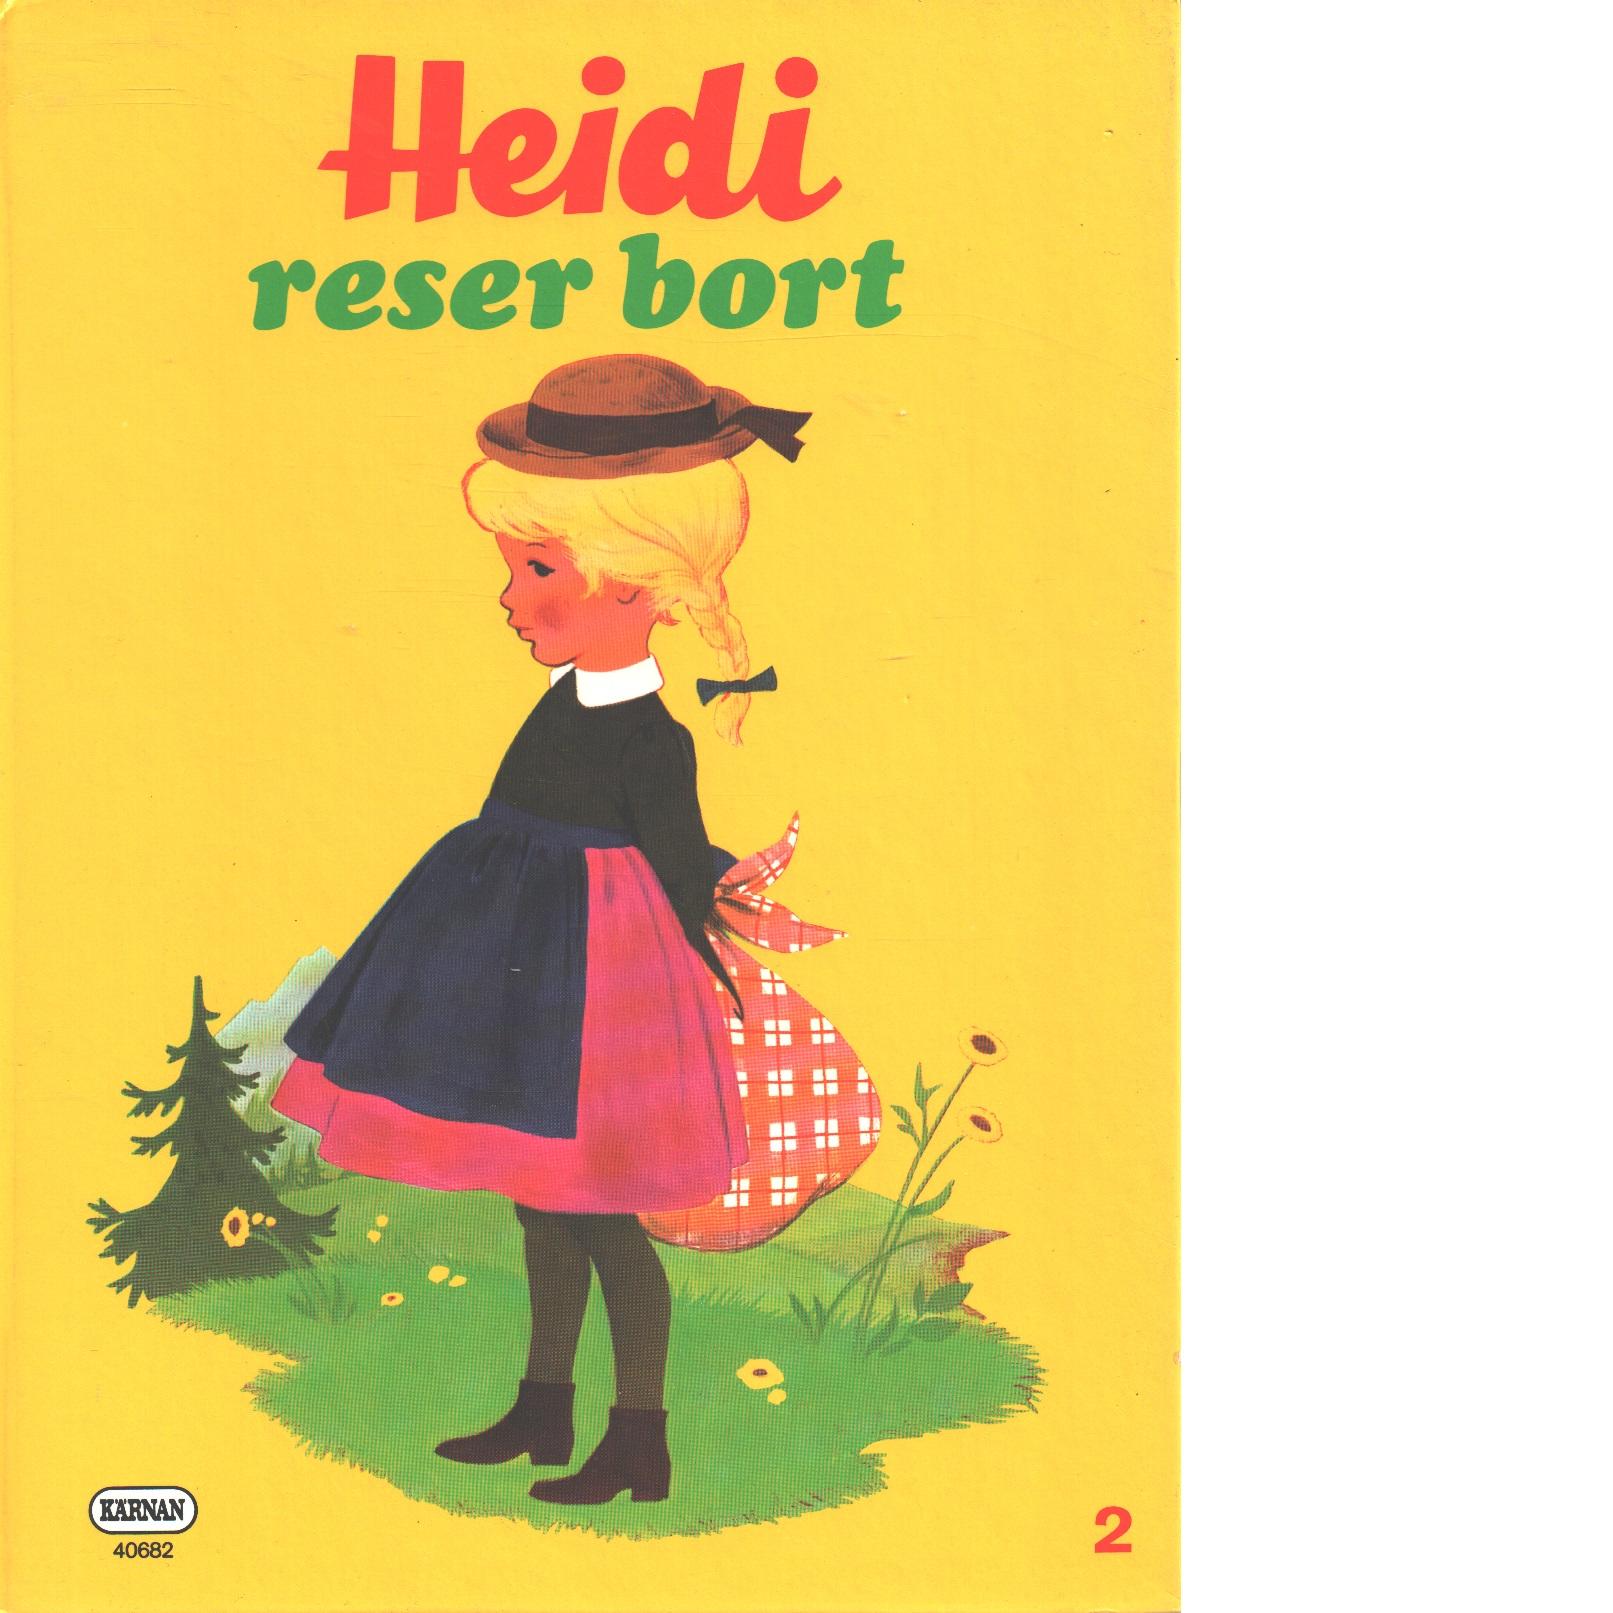 Heidi reser bort - Spyri, Johanna